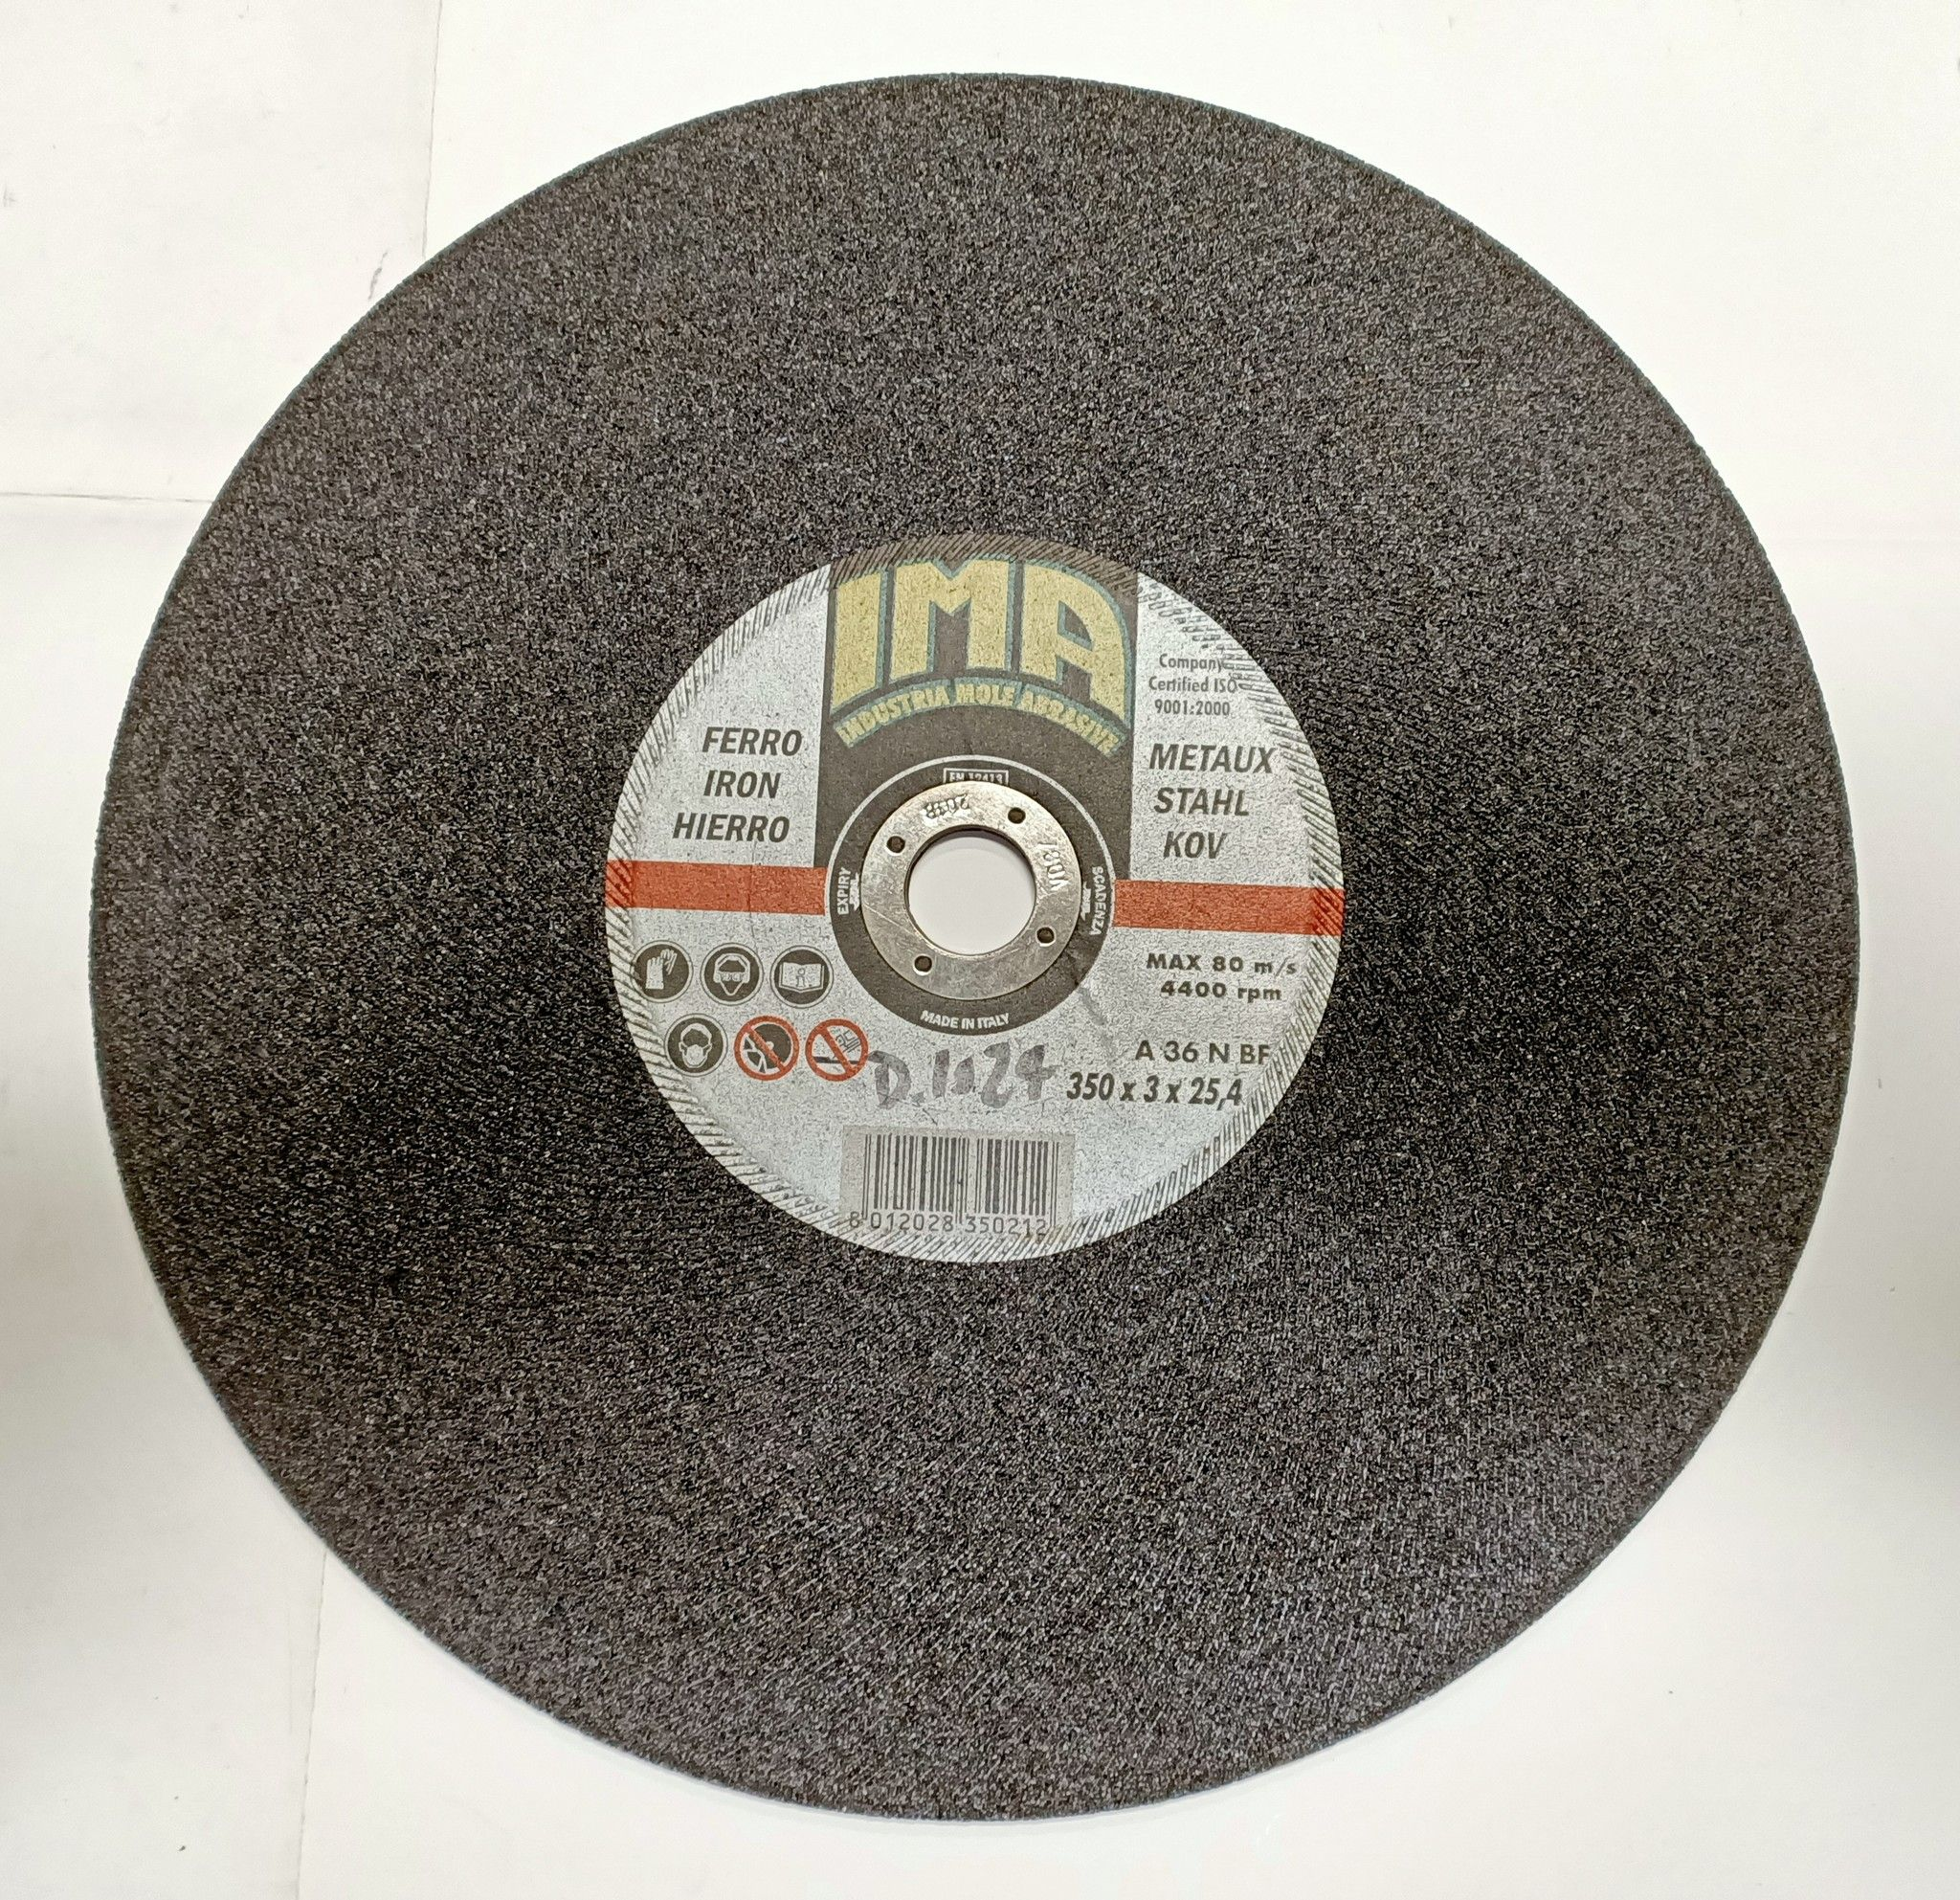 Disco abrasivo per taglio metalli d. 350x3,0 foro 25,4